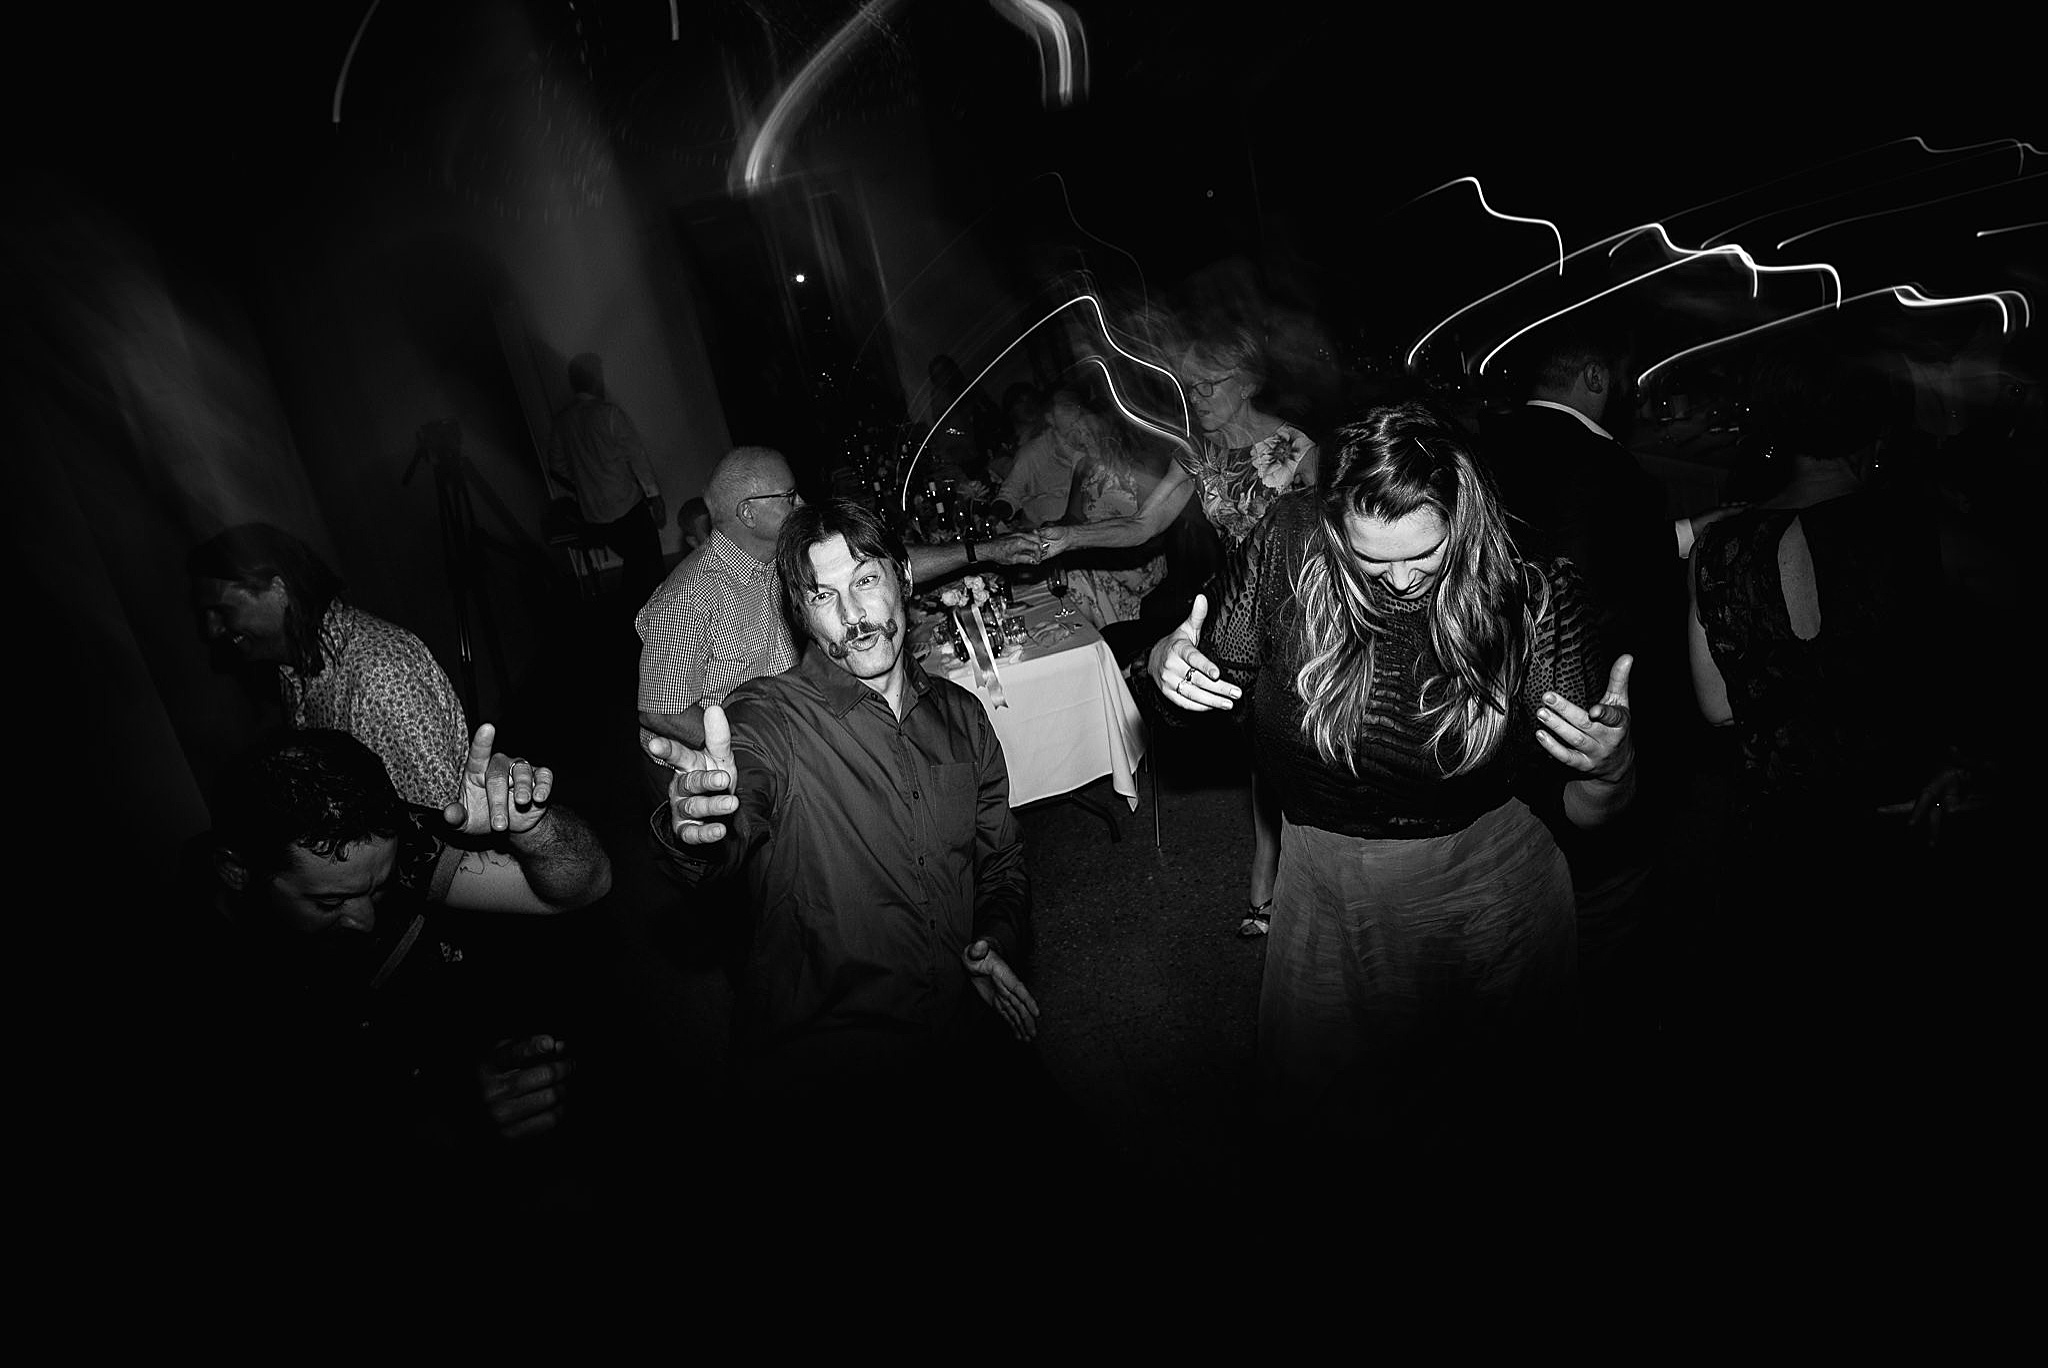 Moxom & Whitney,canberra weddings,Canberra Wedding Photography,Canberra Wedding Photographer,canberra wedding,ACT weddings,ACT wedding photographer,country wedding,Canberra Photography,canberra florist,Hay Field,Grazing at Gundaroo,Grazing,Keepsakephoto by the Keeffes,Moxom and Whitney,